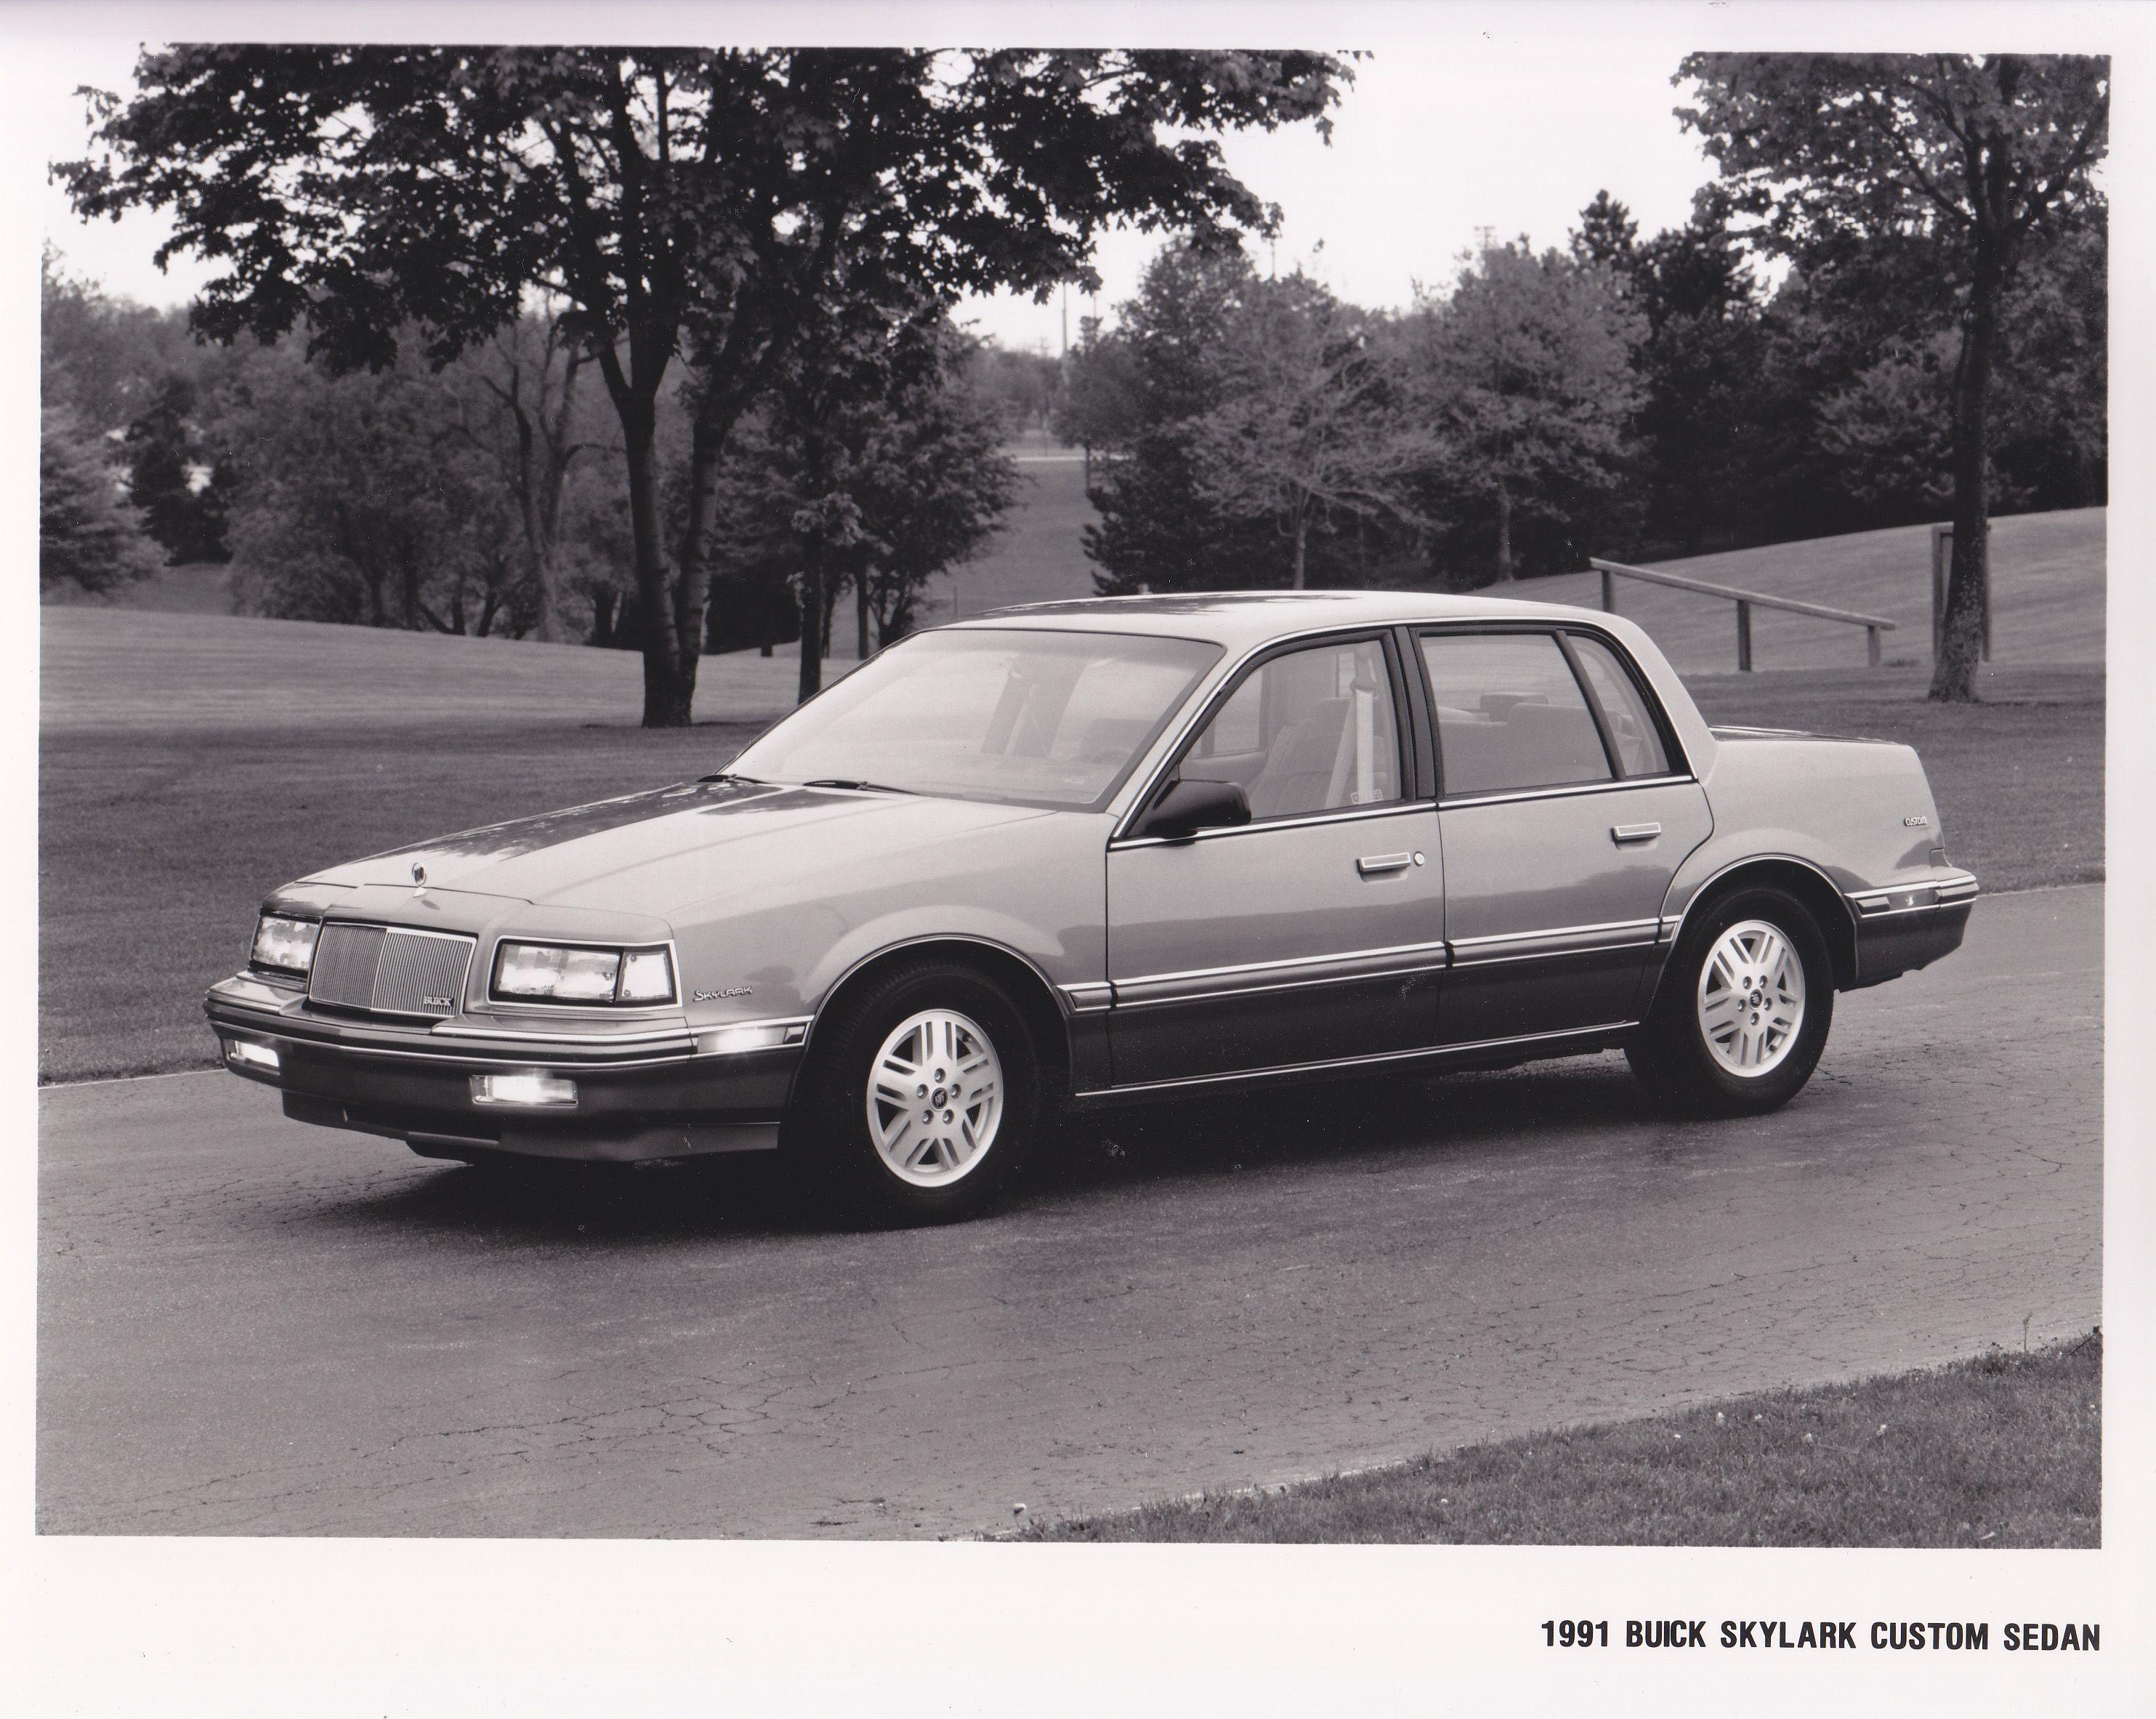 Buick Skylark Custom Sedan 1991 USA